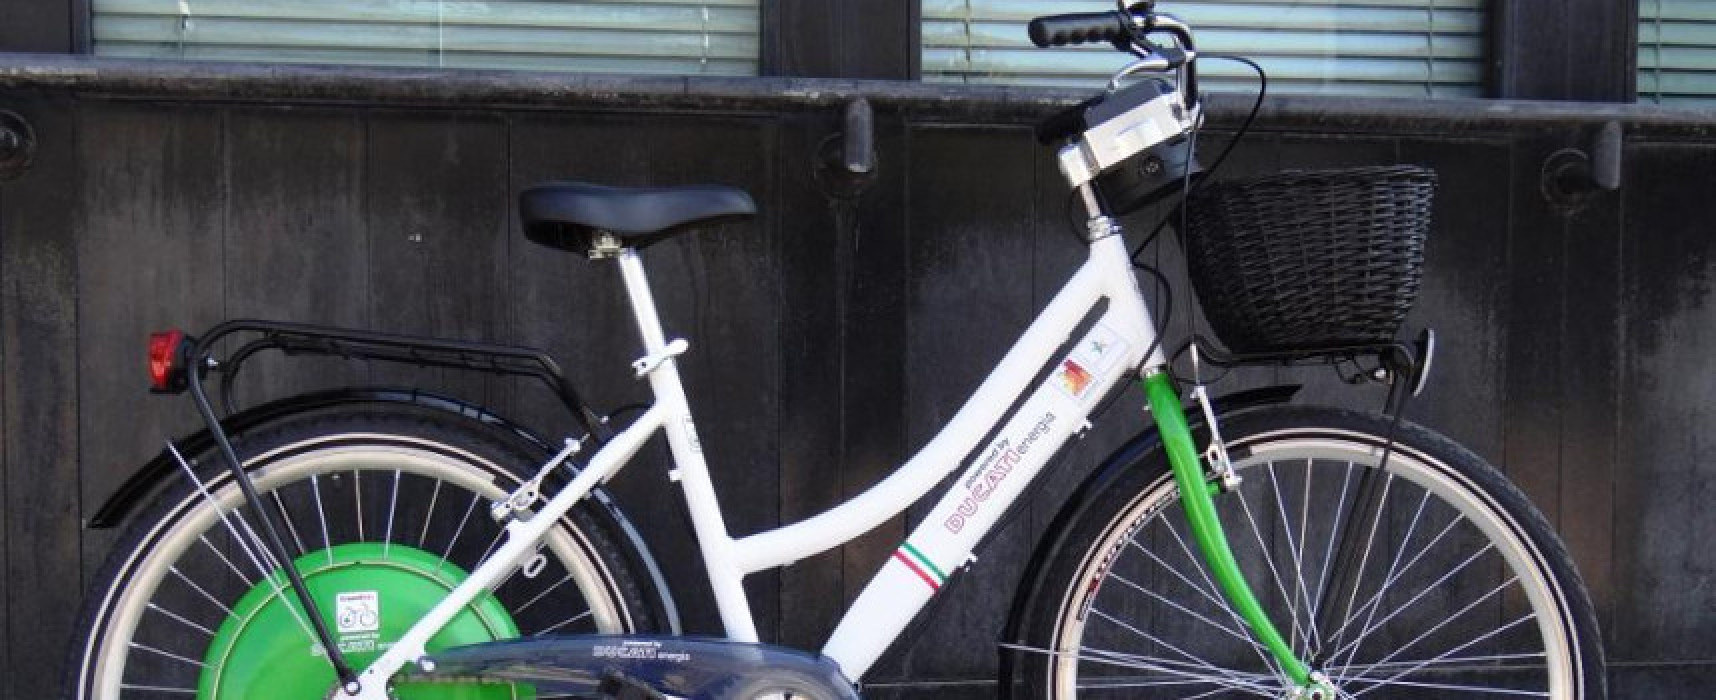 E-bike 0, in arrivo altre venti bici a pedalata assistita e zero emissioni